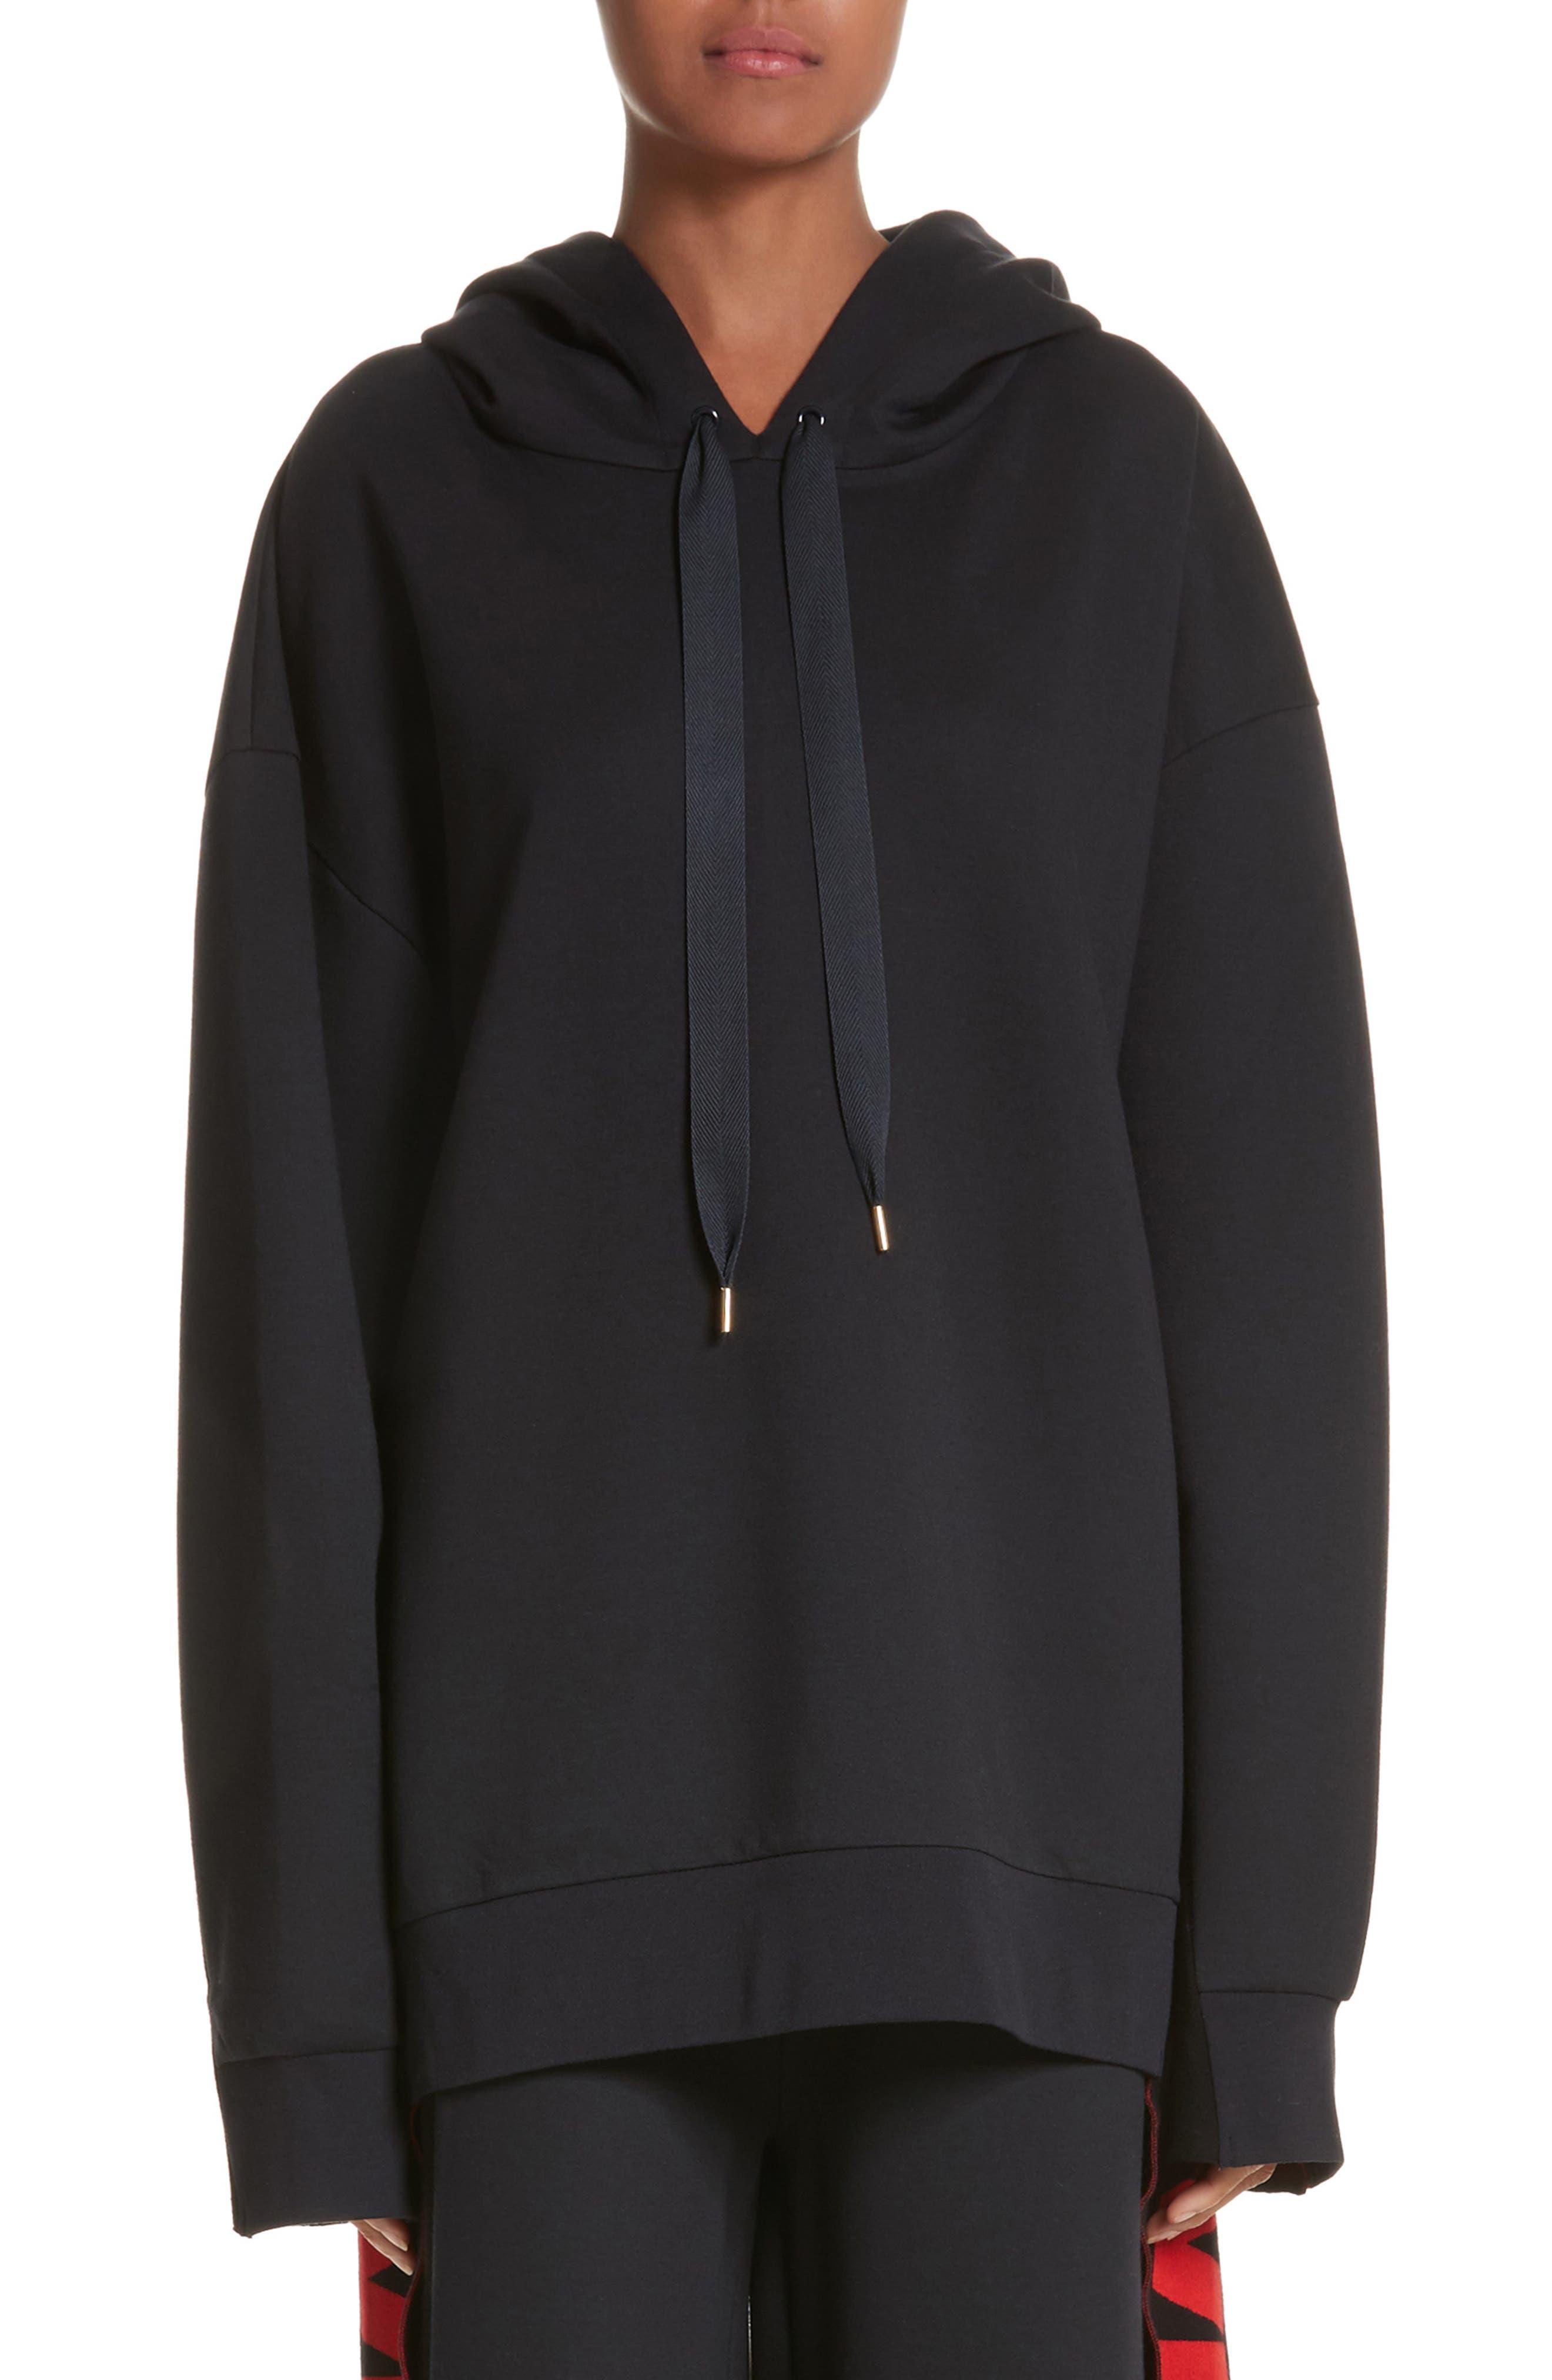 Stella McCartney All Is Love Oversize Sweatshirt